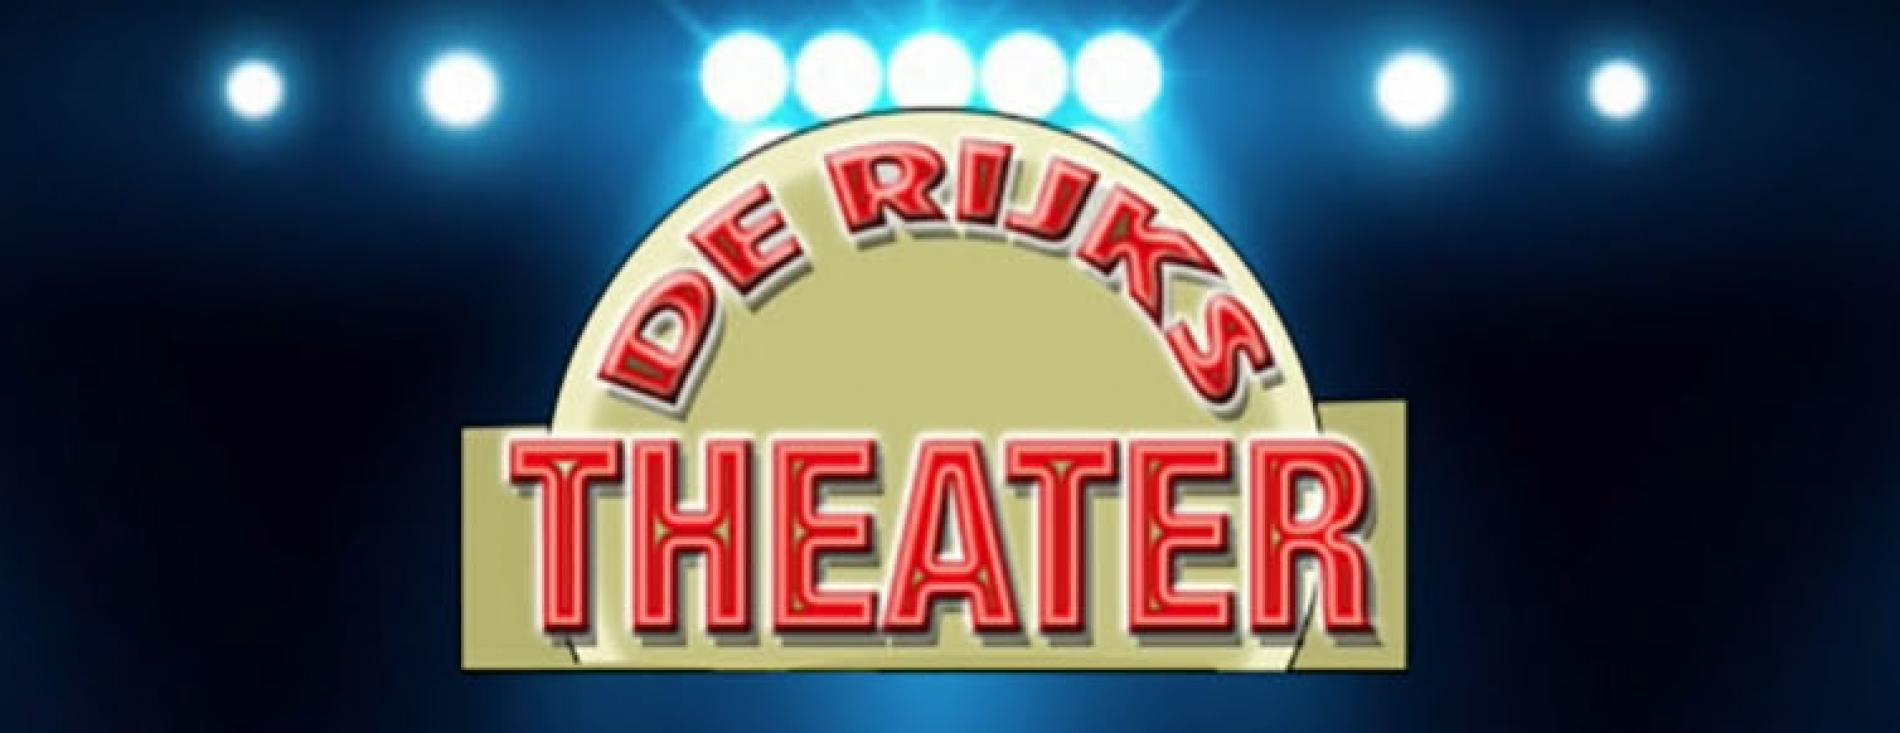 header De rijks theater